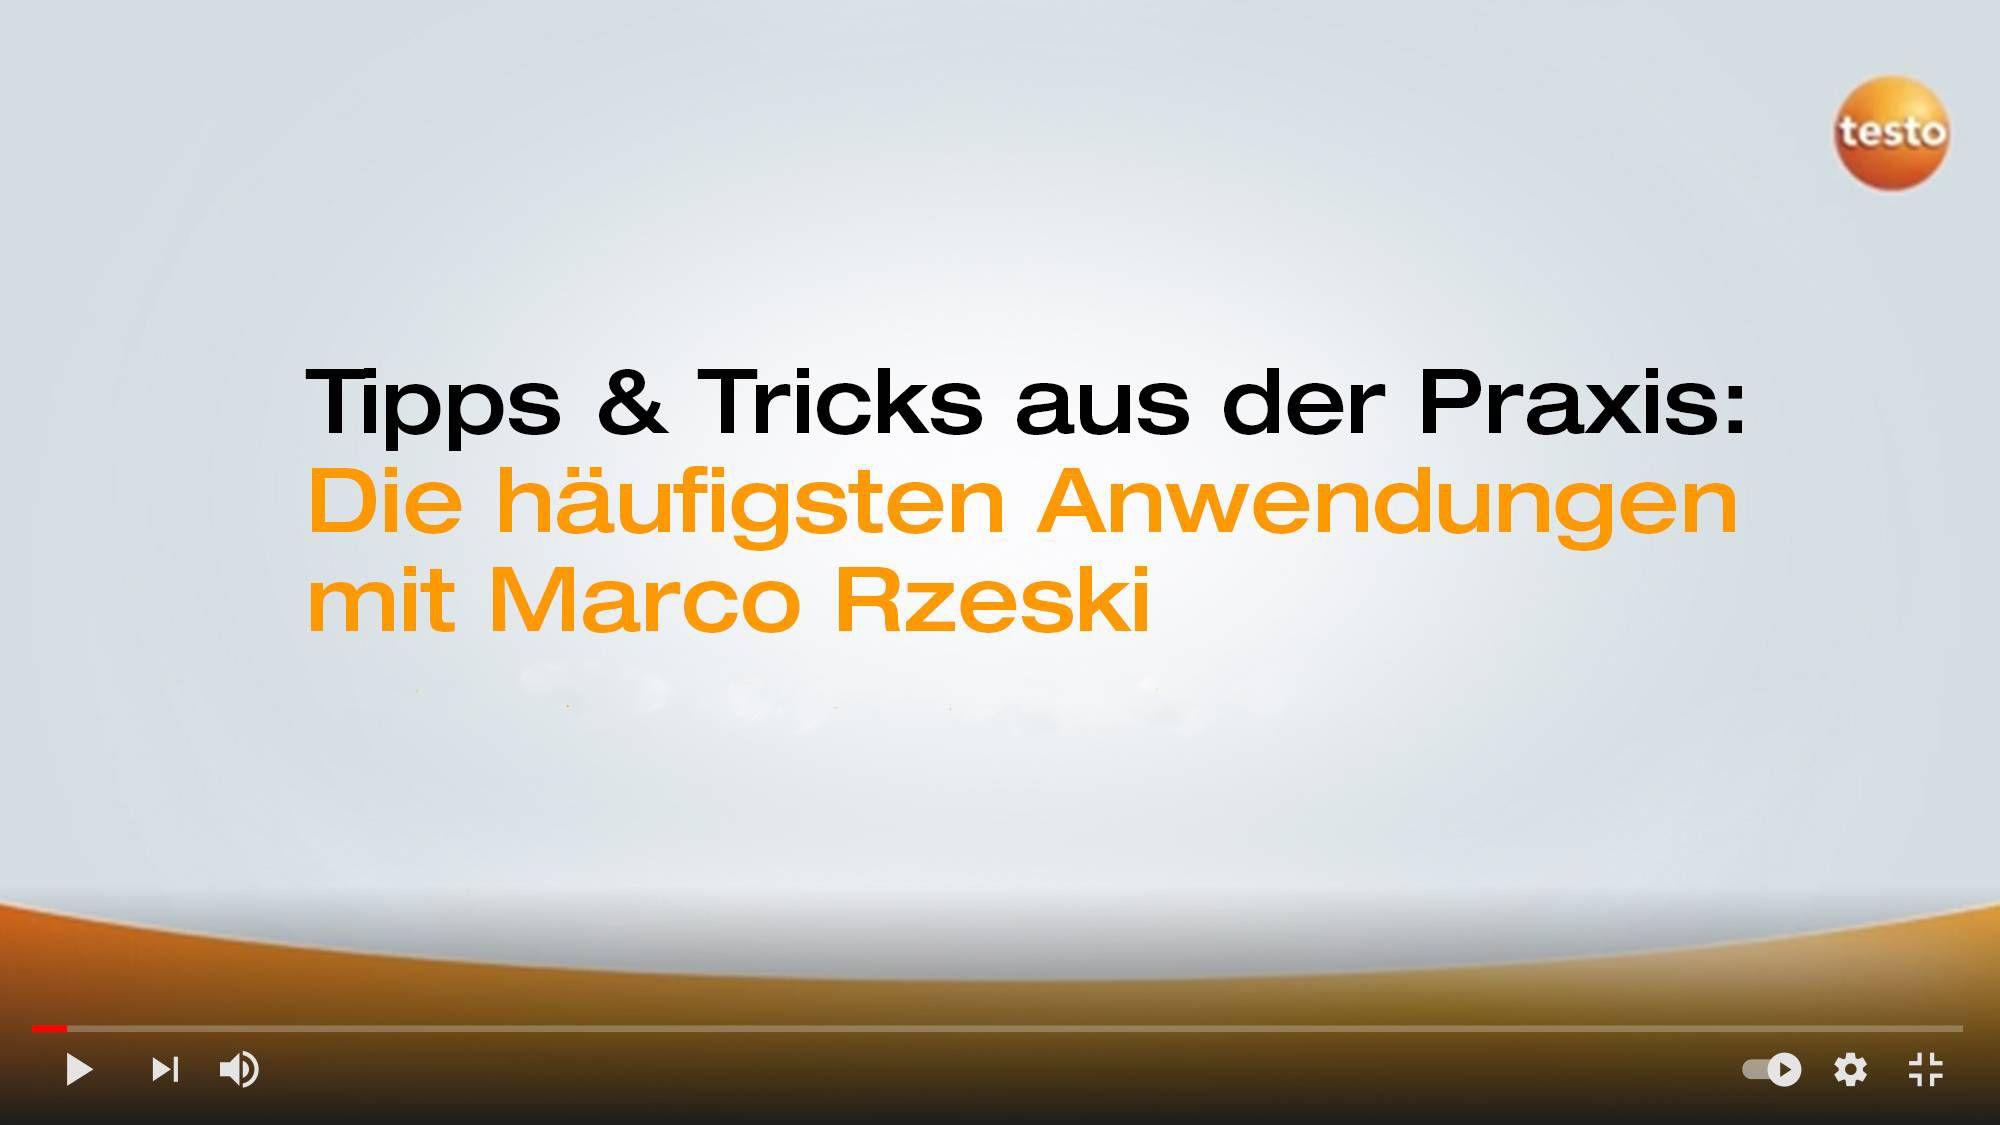 i-hv-sp-Heating-2021-Herbstaktion_Marco-Rzeski_Service-Talk_2000x1125px_Text.jpg